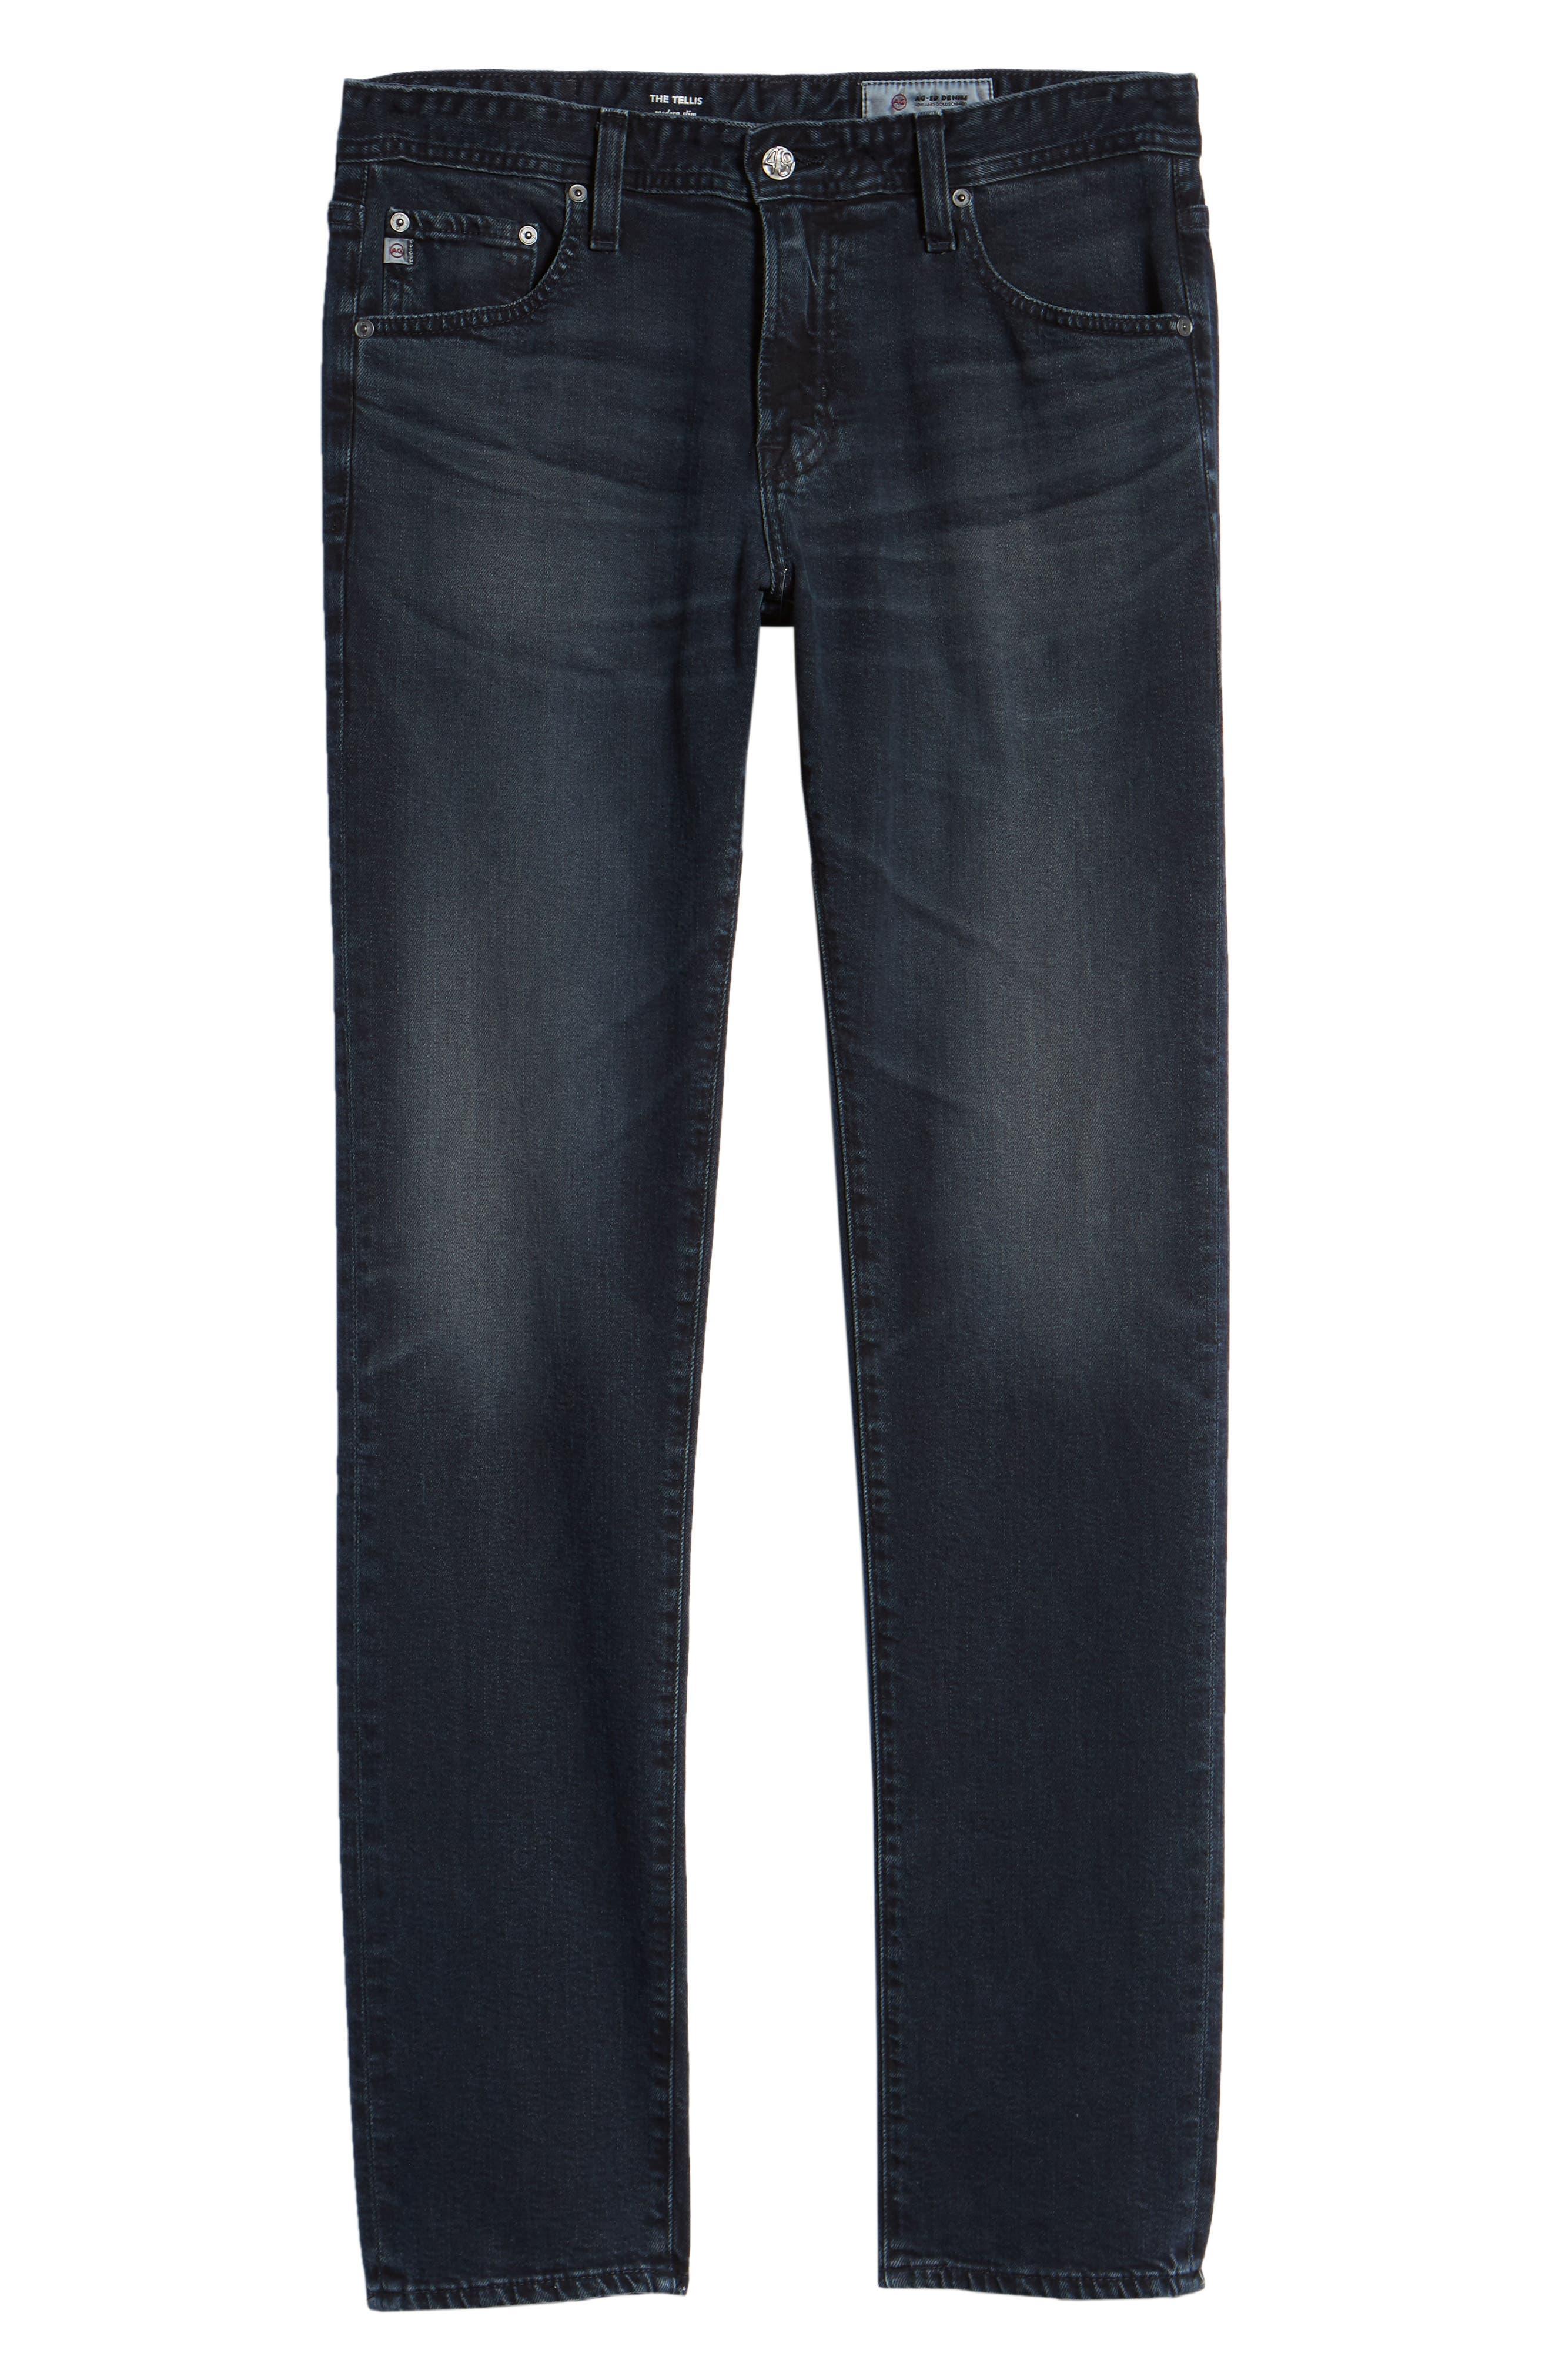 Tellis Slim Fit Jeans,                             Alternate thumbnail 6, color,                             2 YEARS RUMBLE